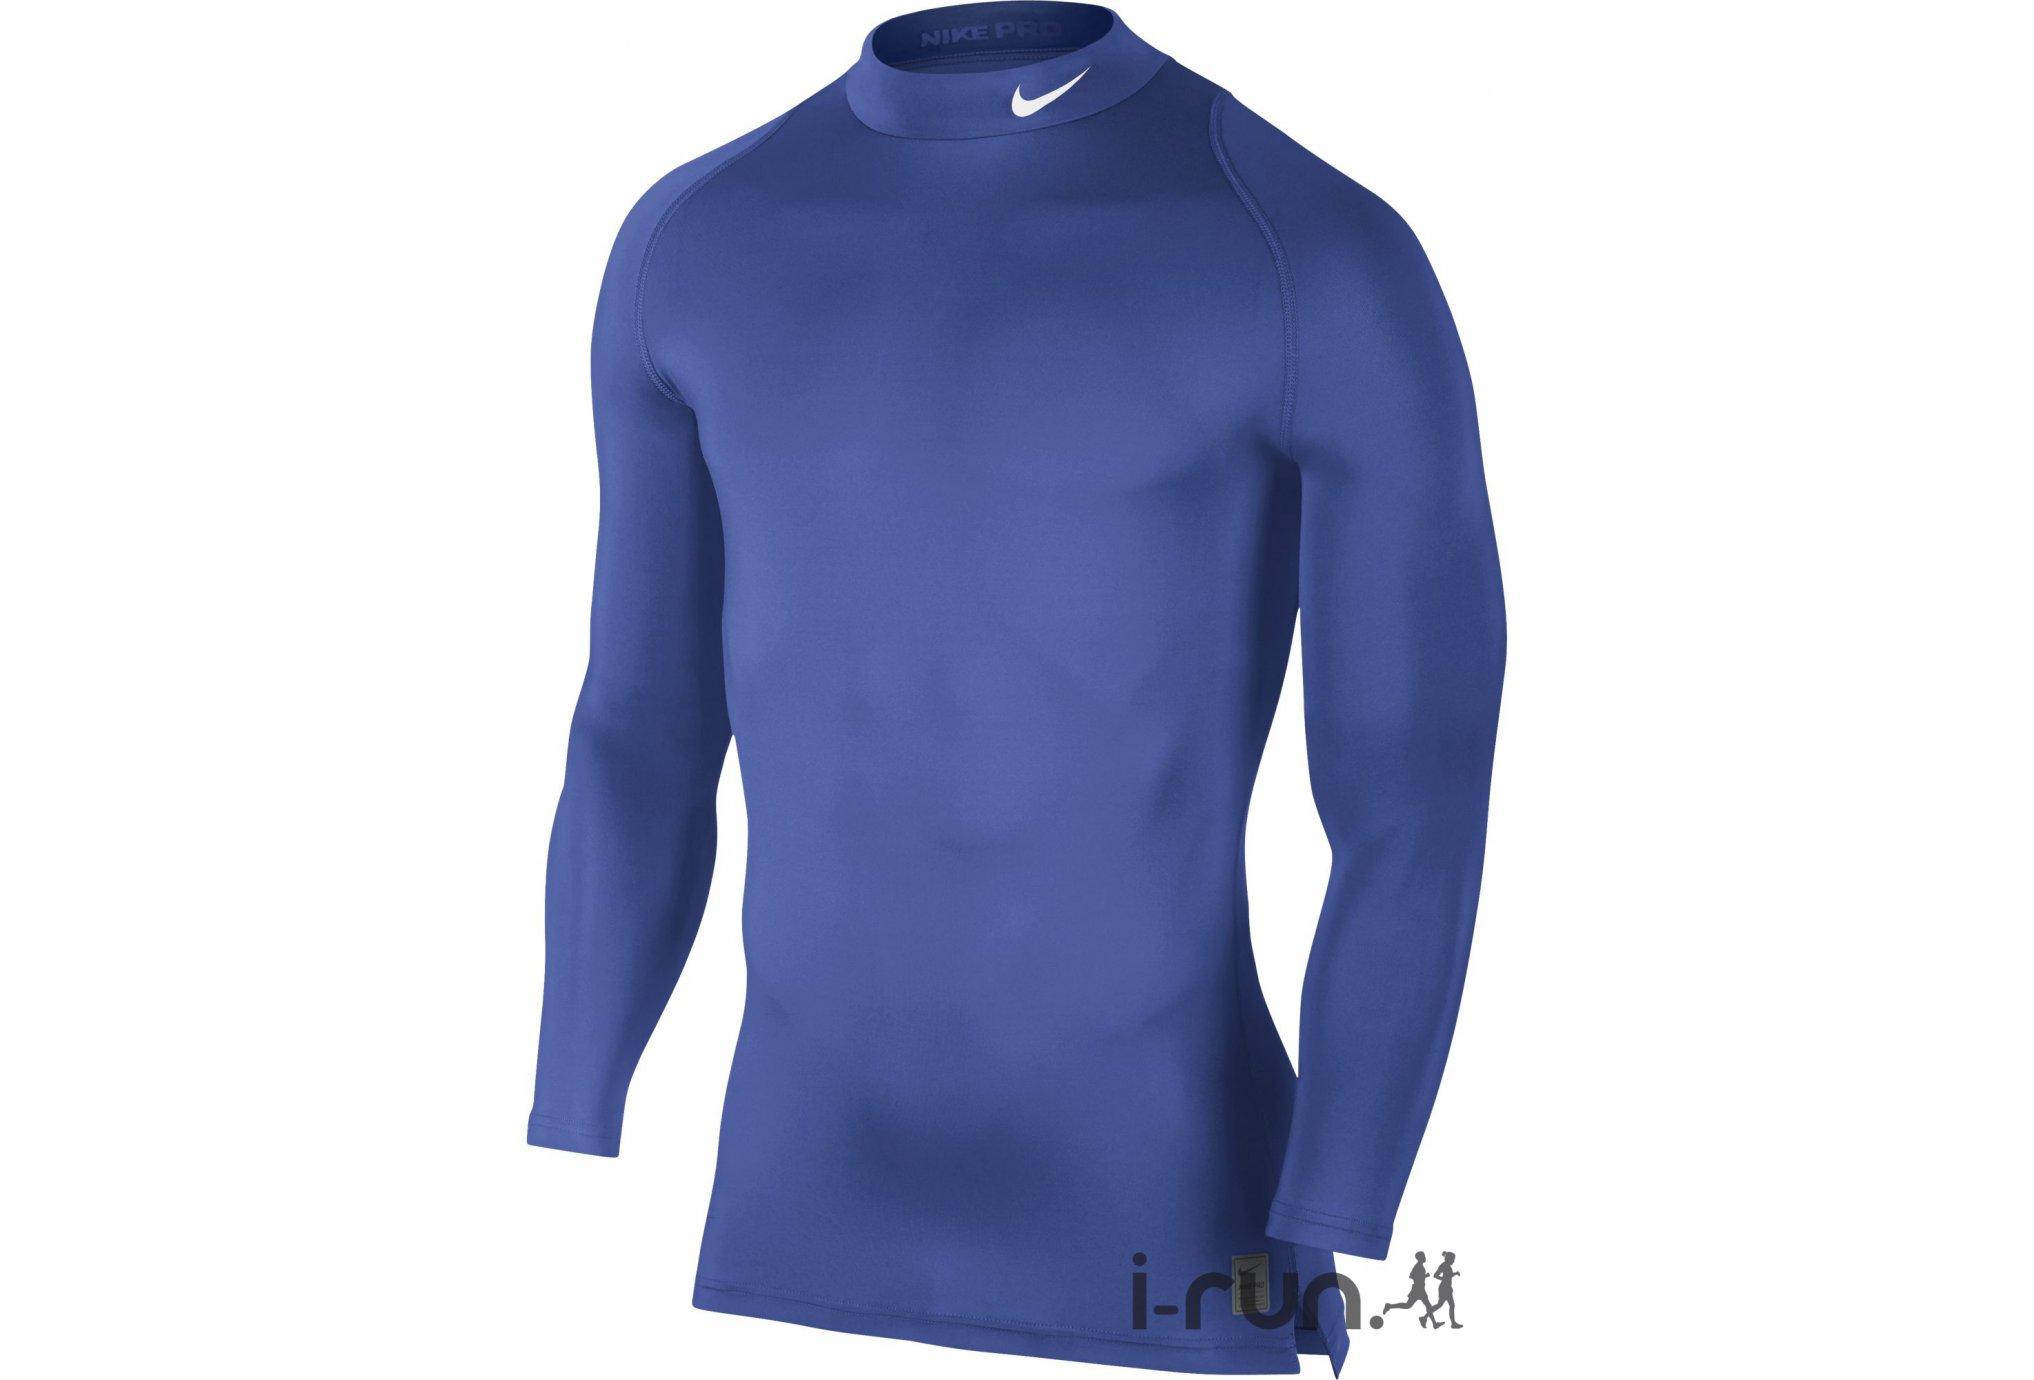 Trail Session - Nike Pro Maillot Cool Compression Mock M vêtement ... da2b434af4c2